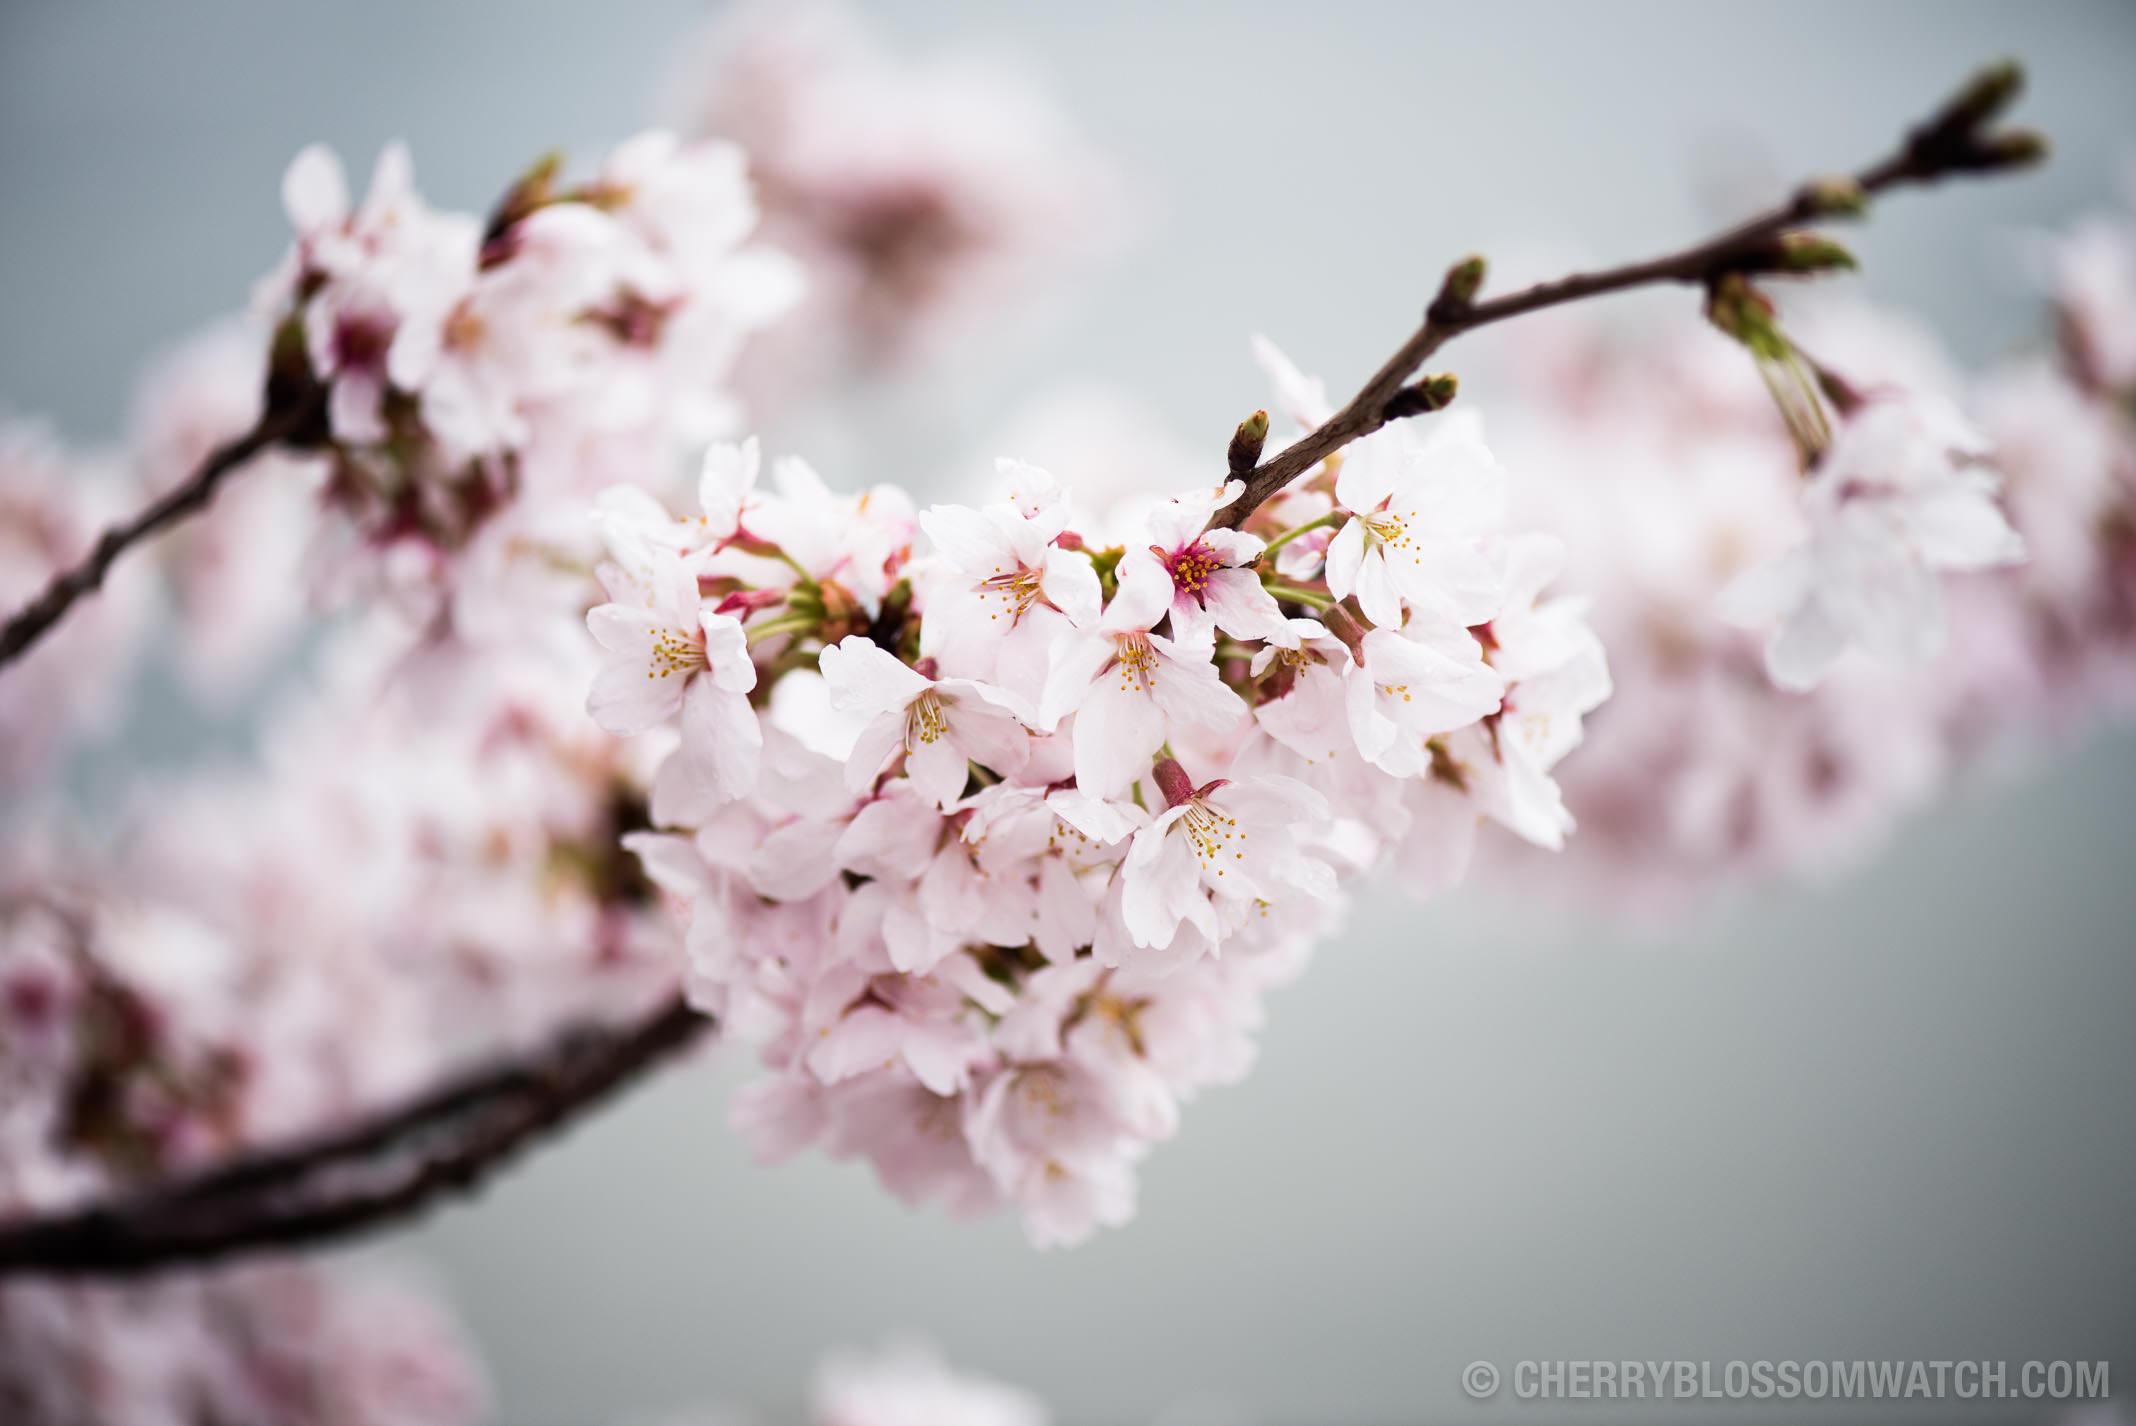 Www cherry blossom com online dating